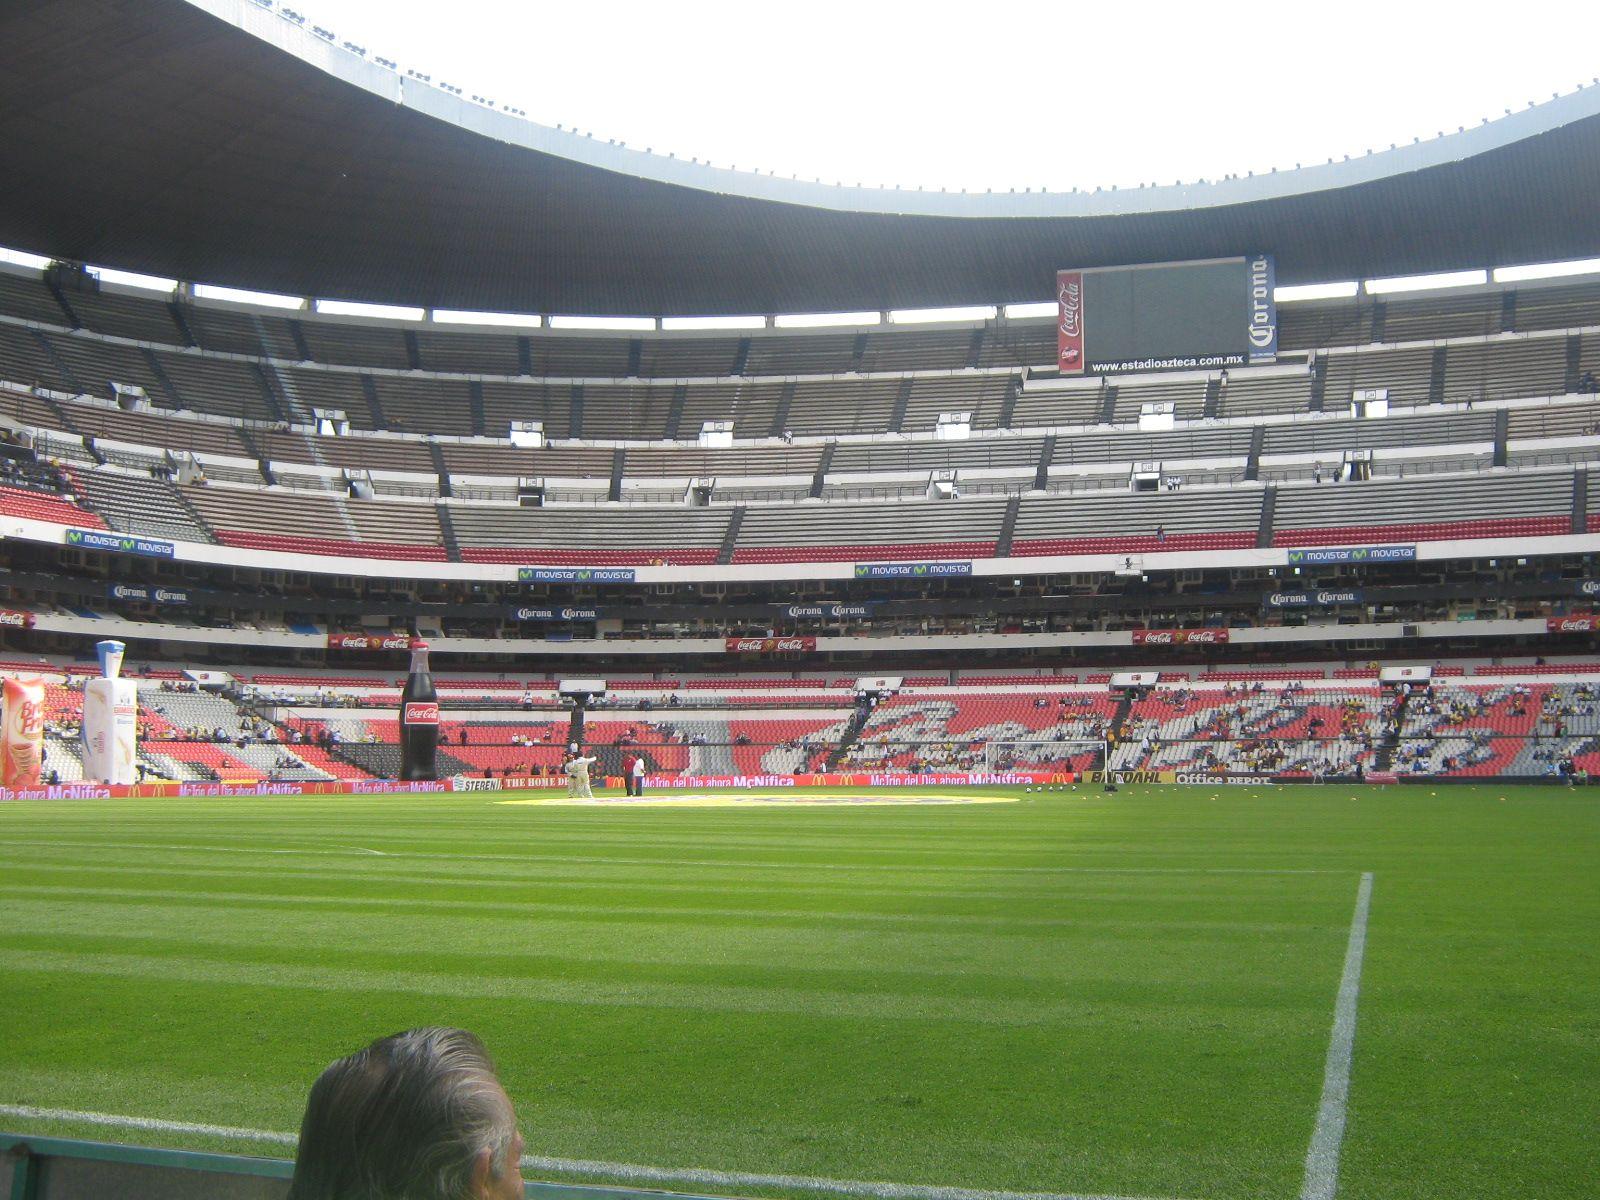 Cancha estadio azteca favorite places spaces for Puerta 1 estadio azteca